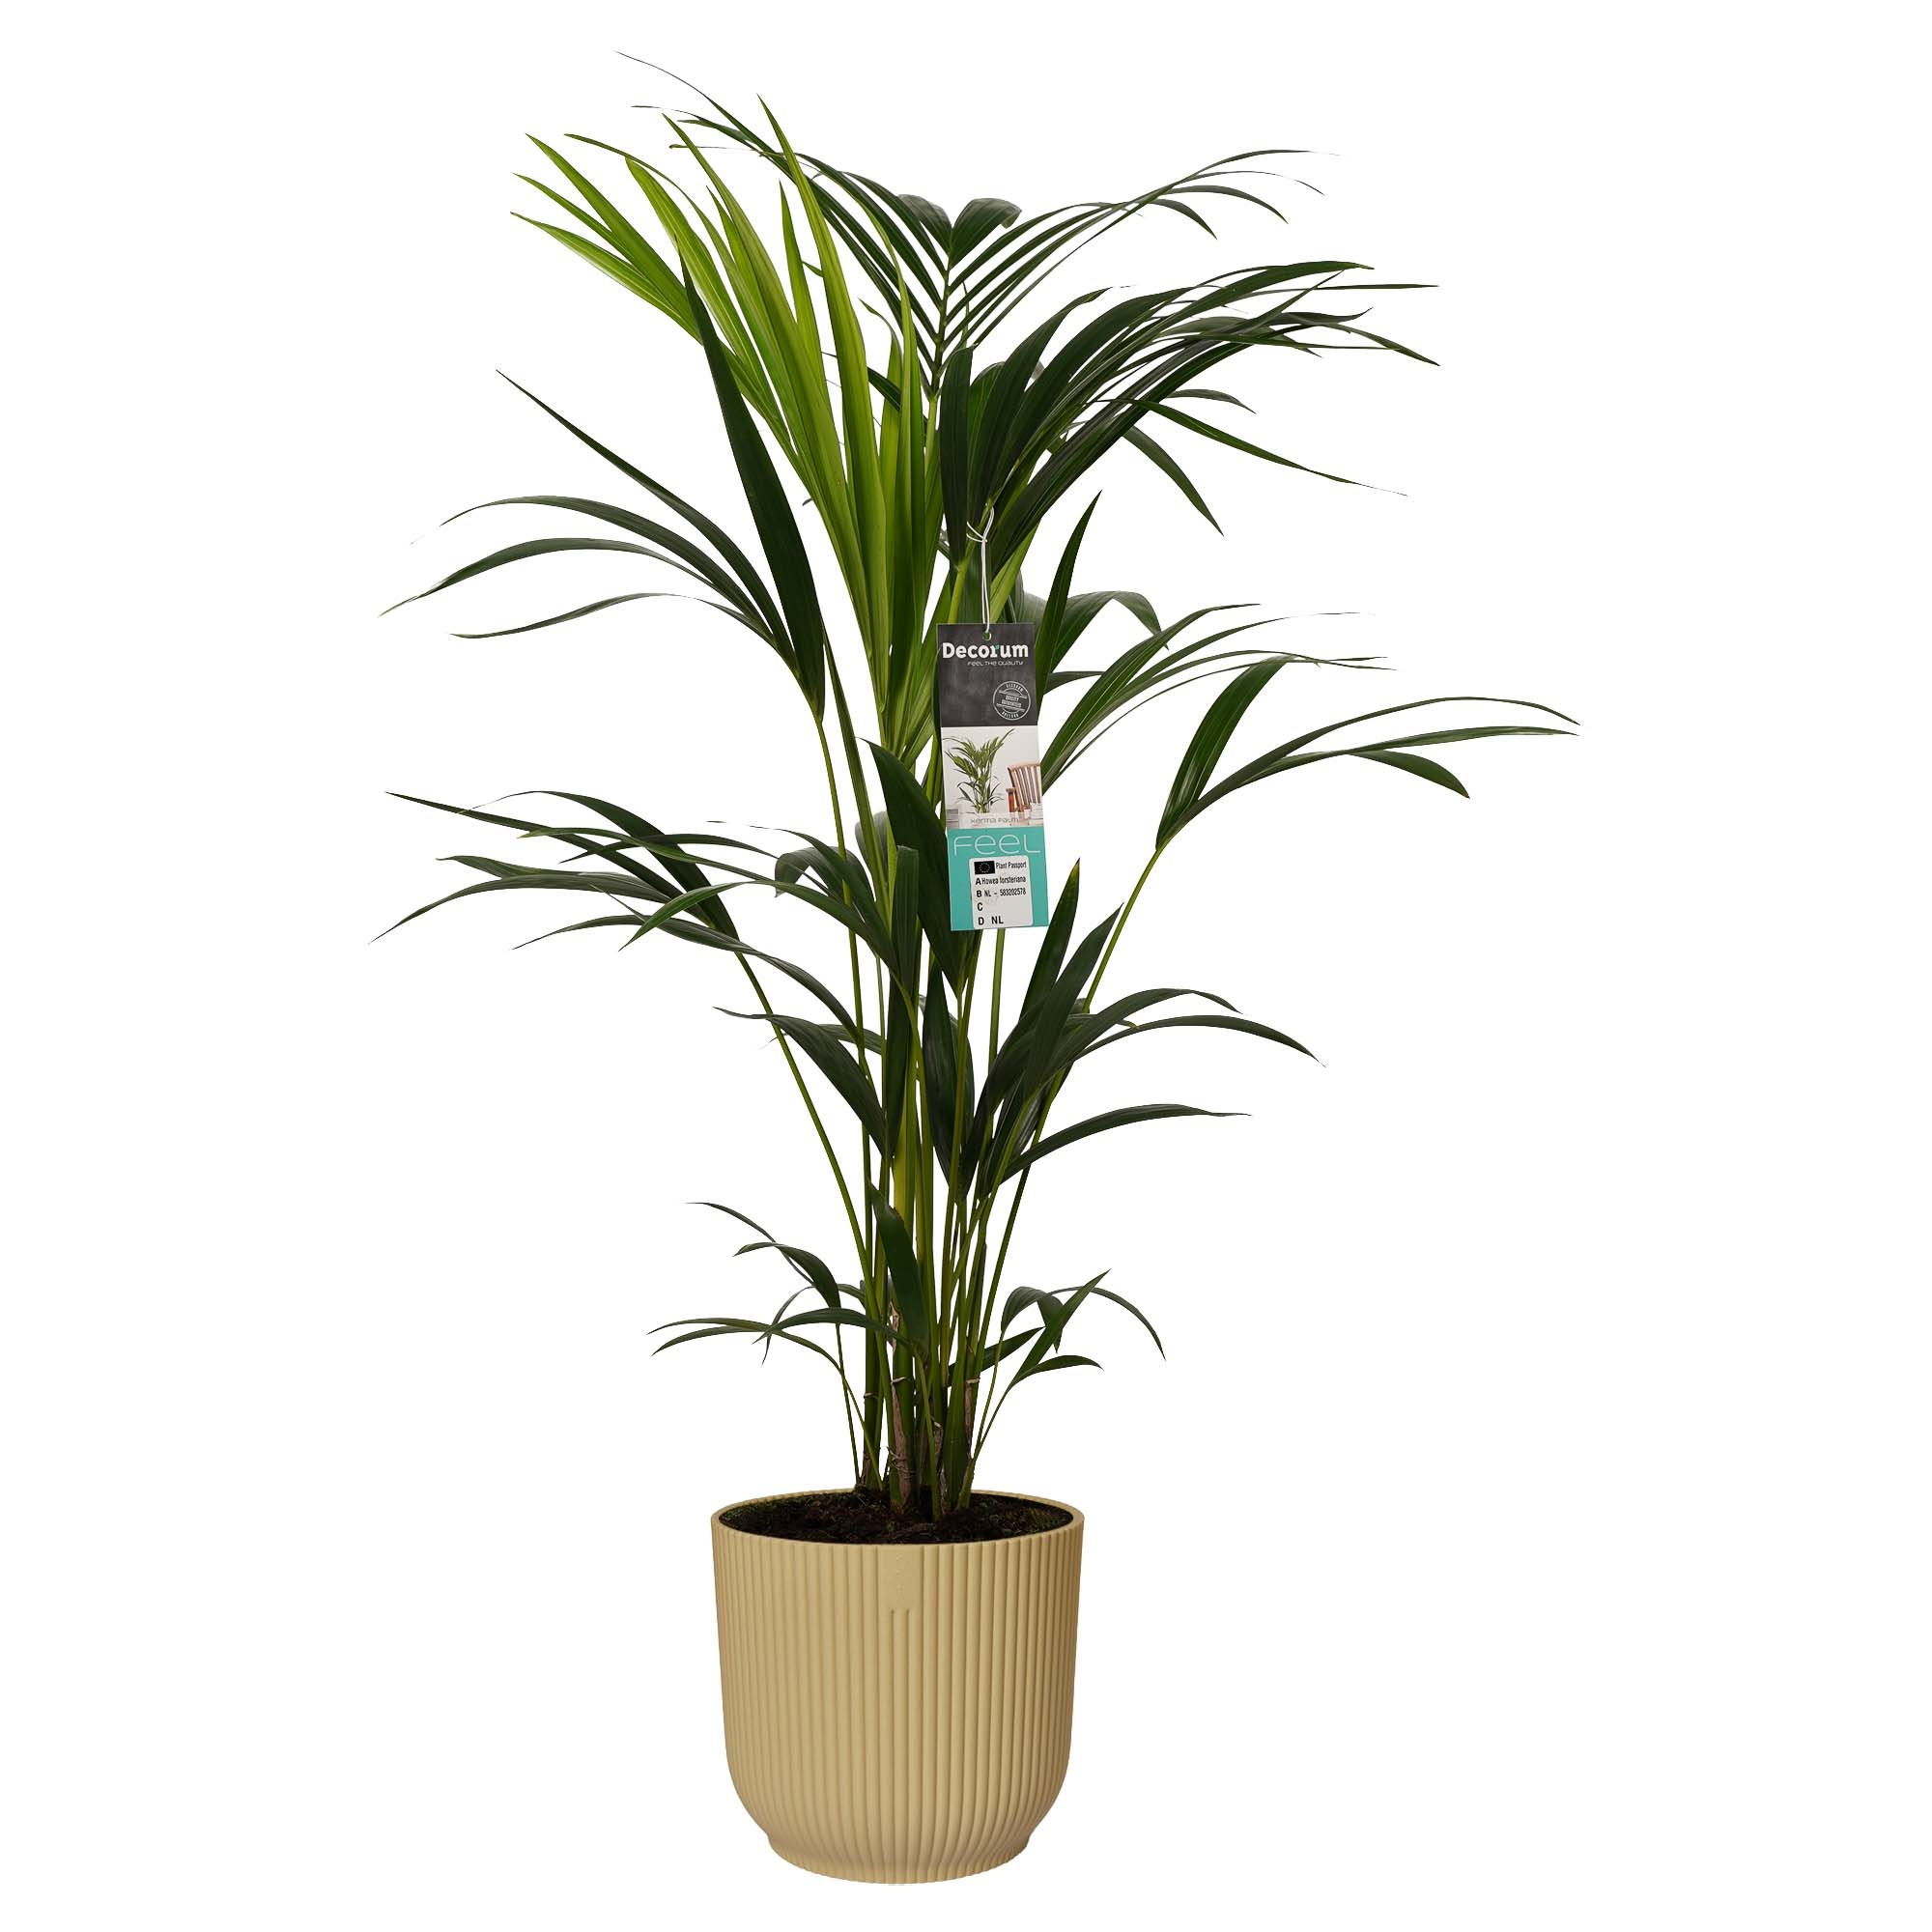 Decorum Kentia Palm in ELHO sierpot Vibes Fold (botergeel) (22x100 cm)